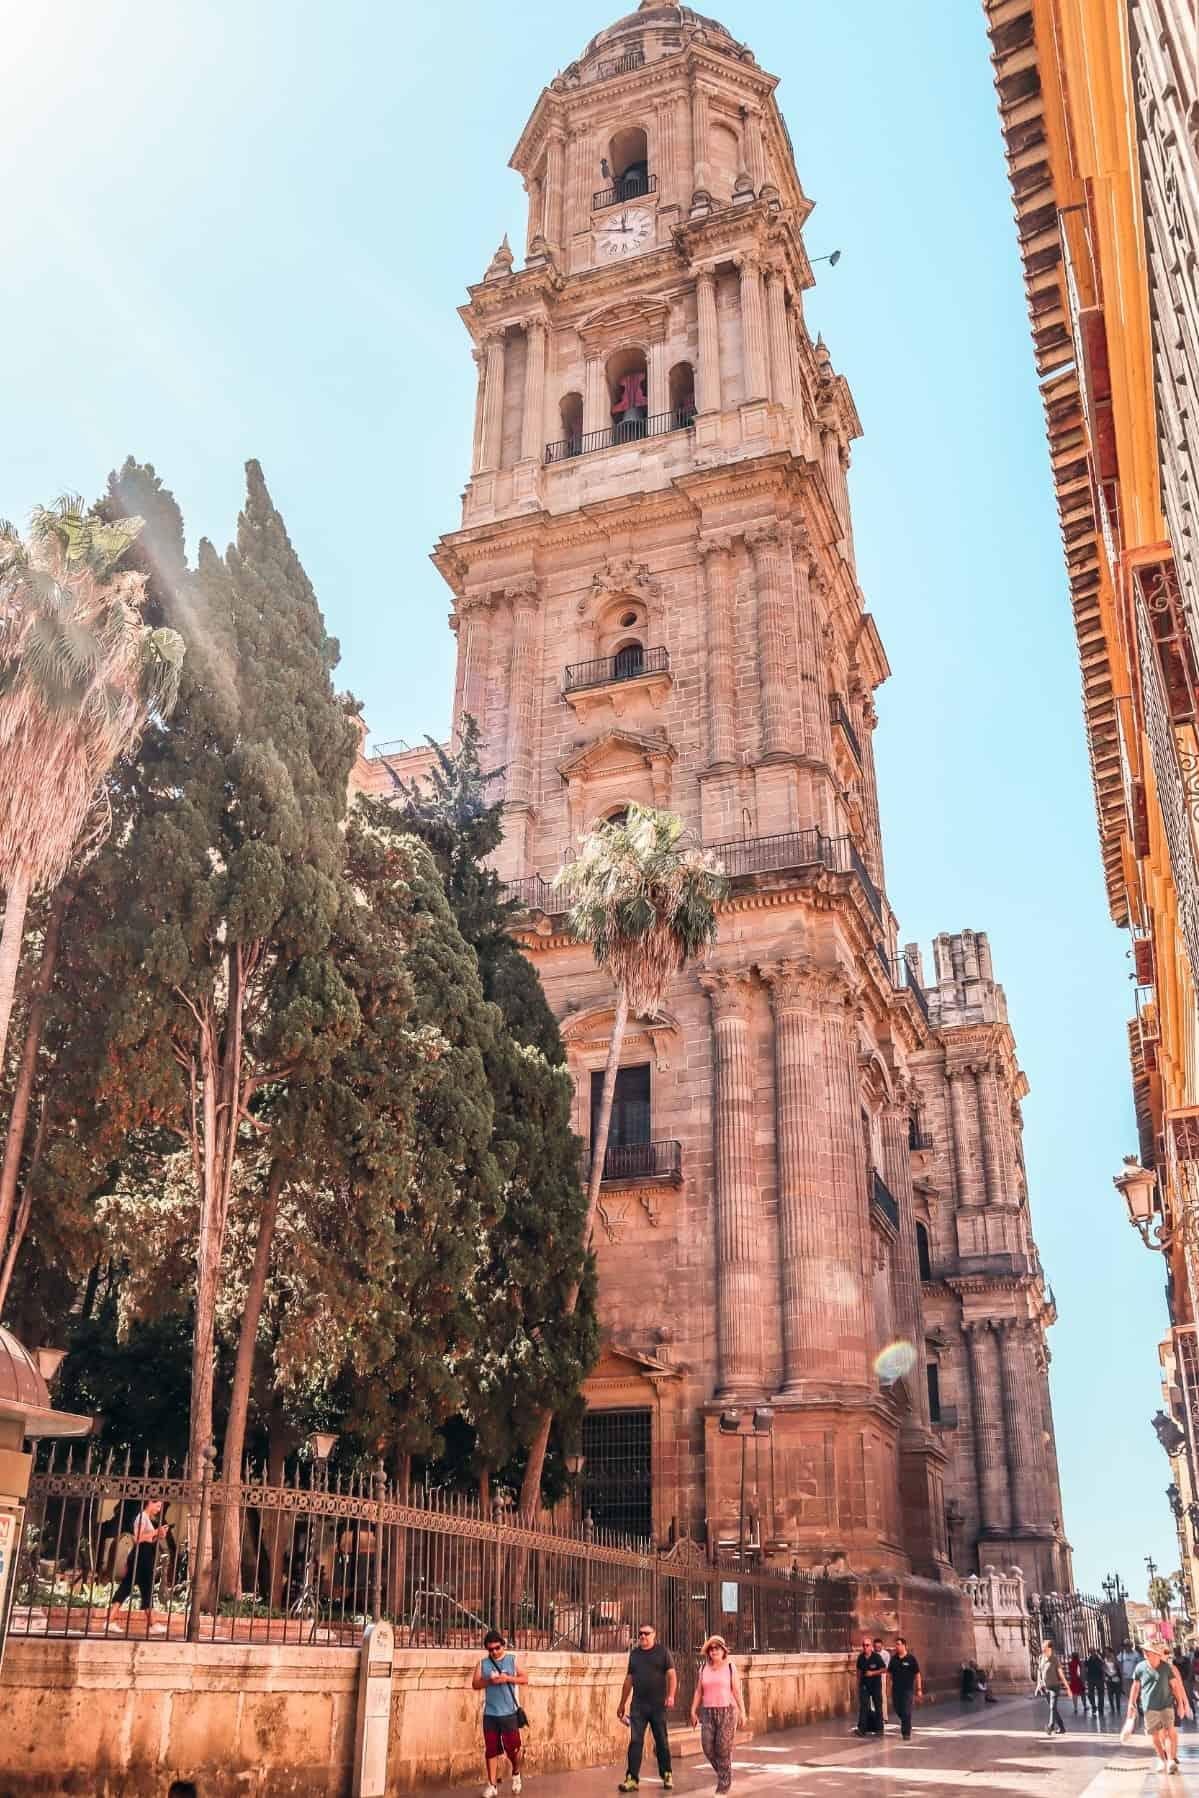 Malaga spain - things to do in malaga